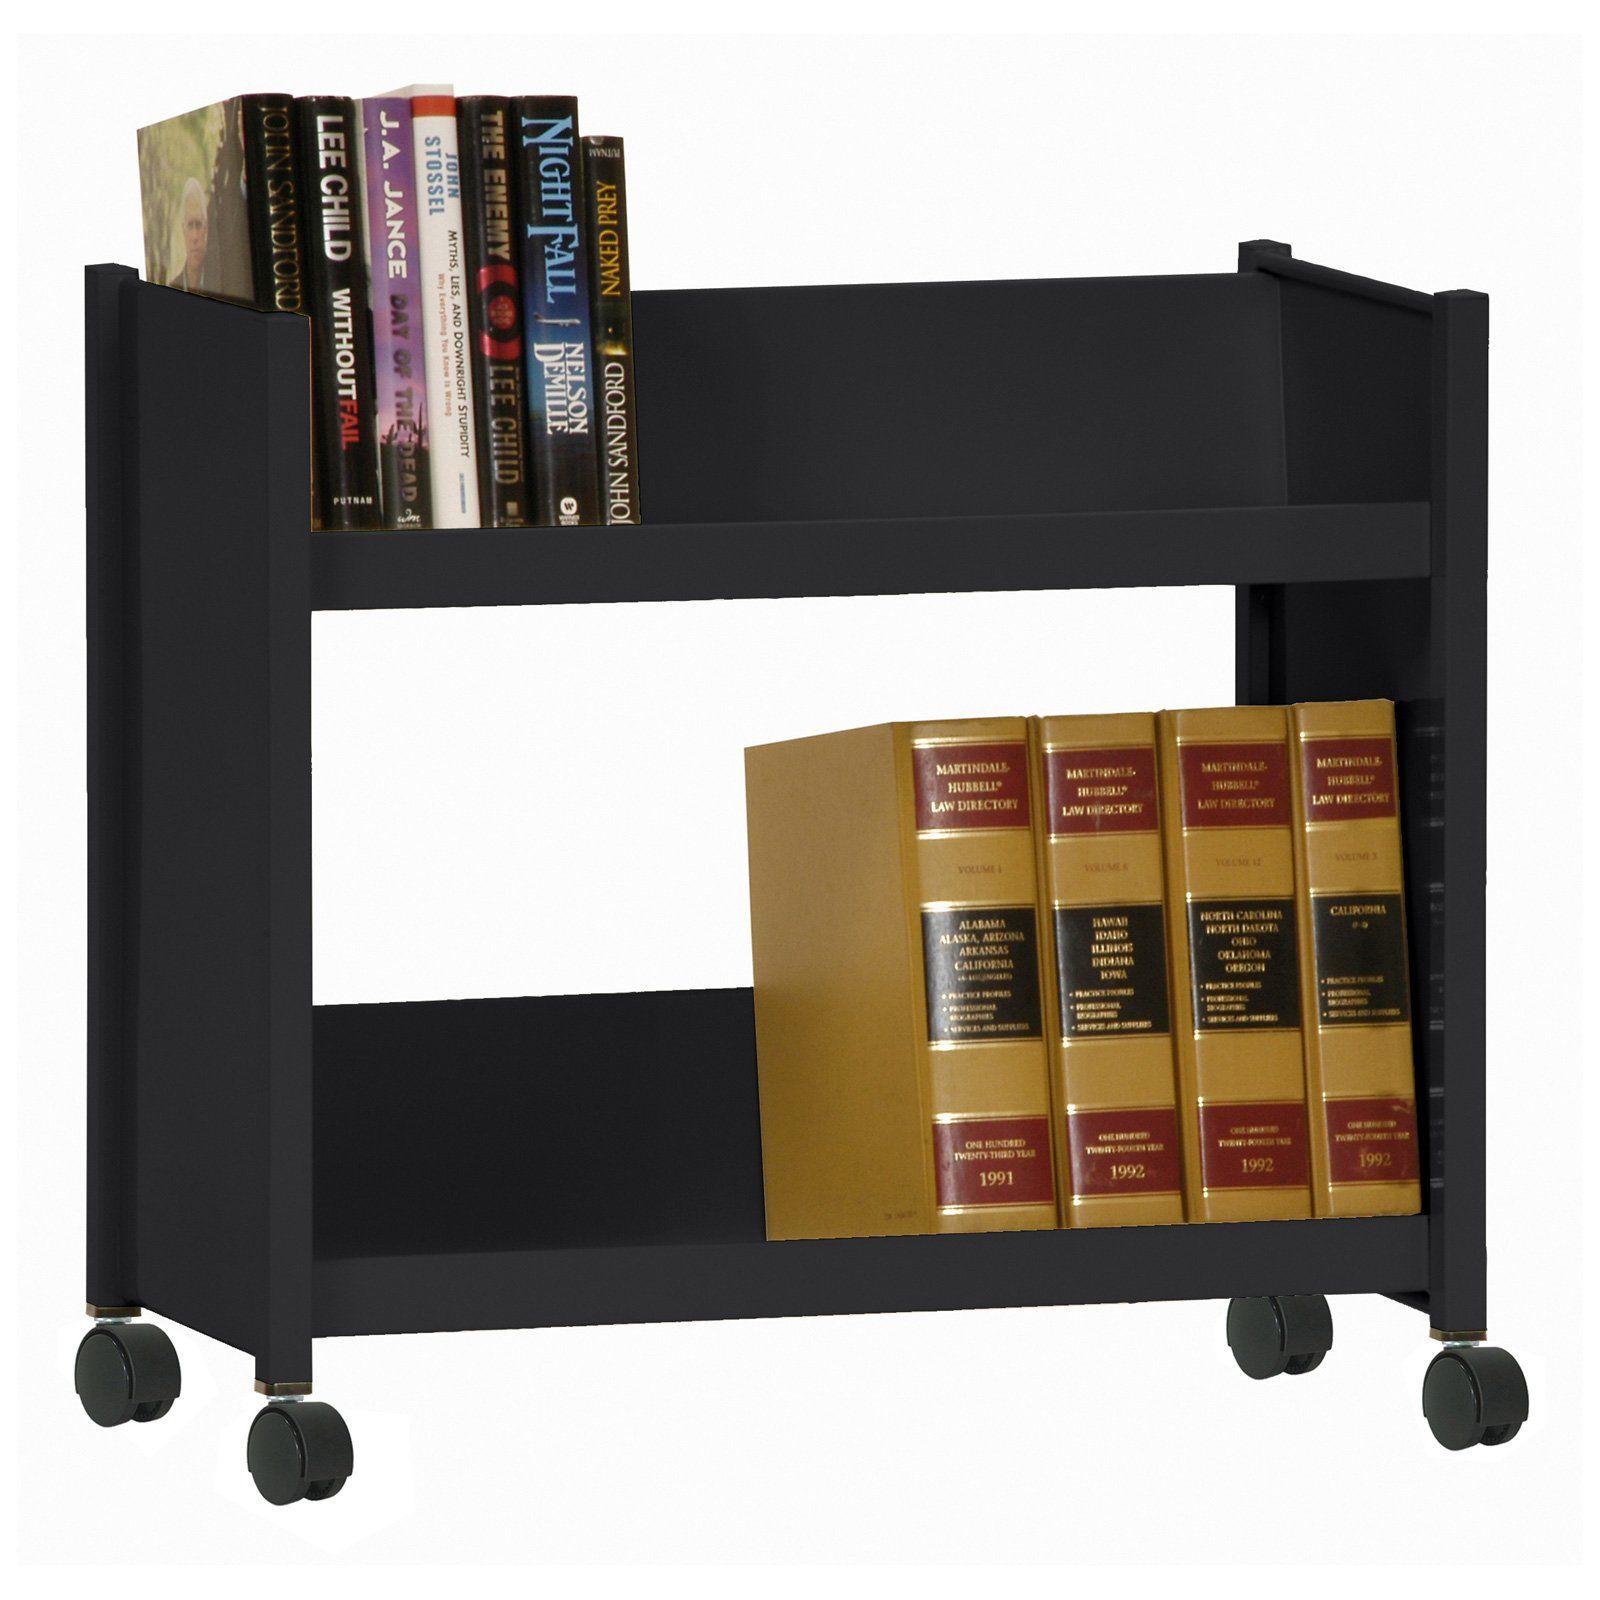 Have To Have It Sandusky Lee Sloped Shelf 2 Tier Mobile Bookcase